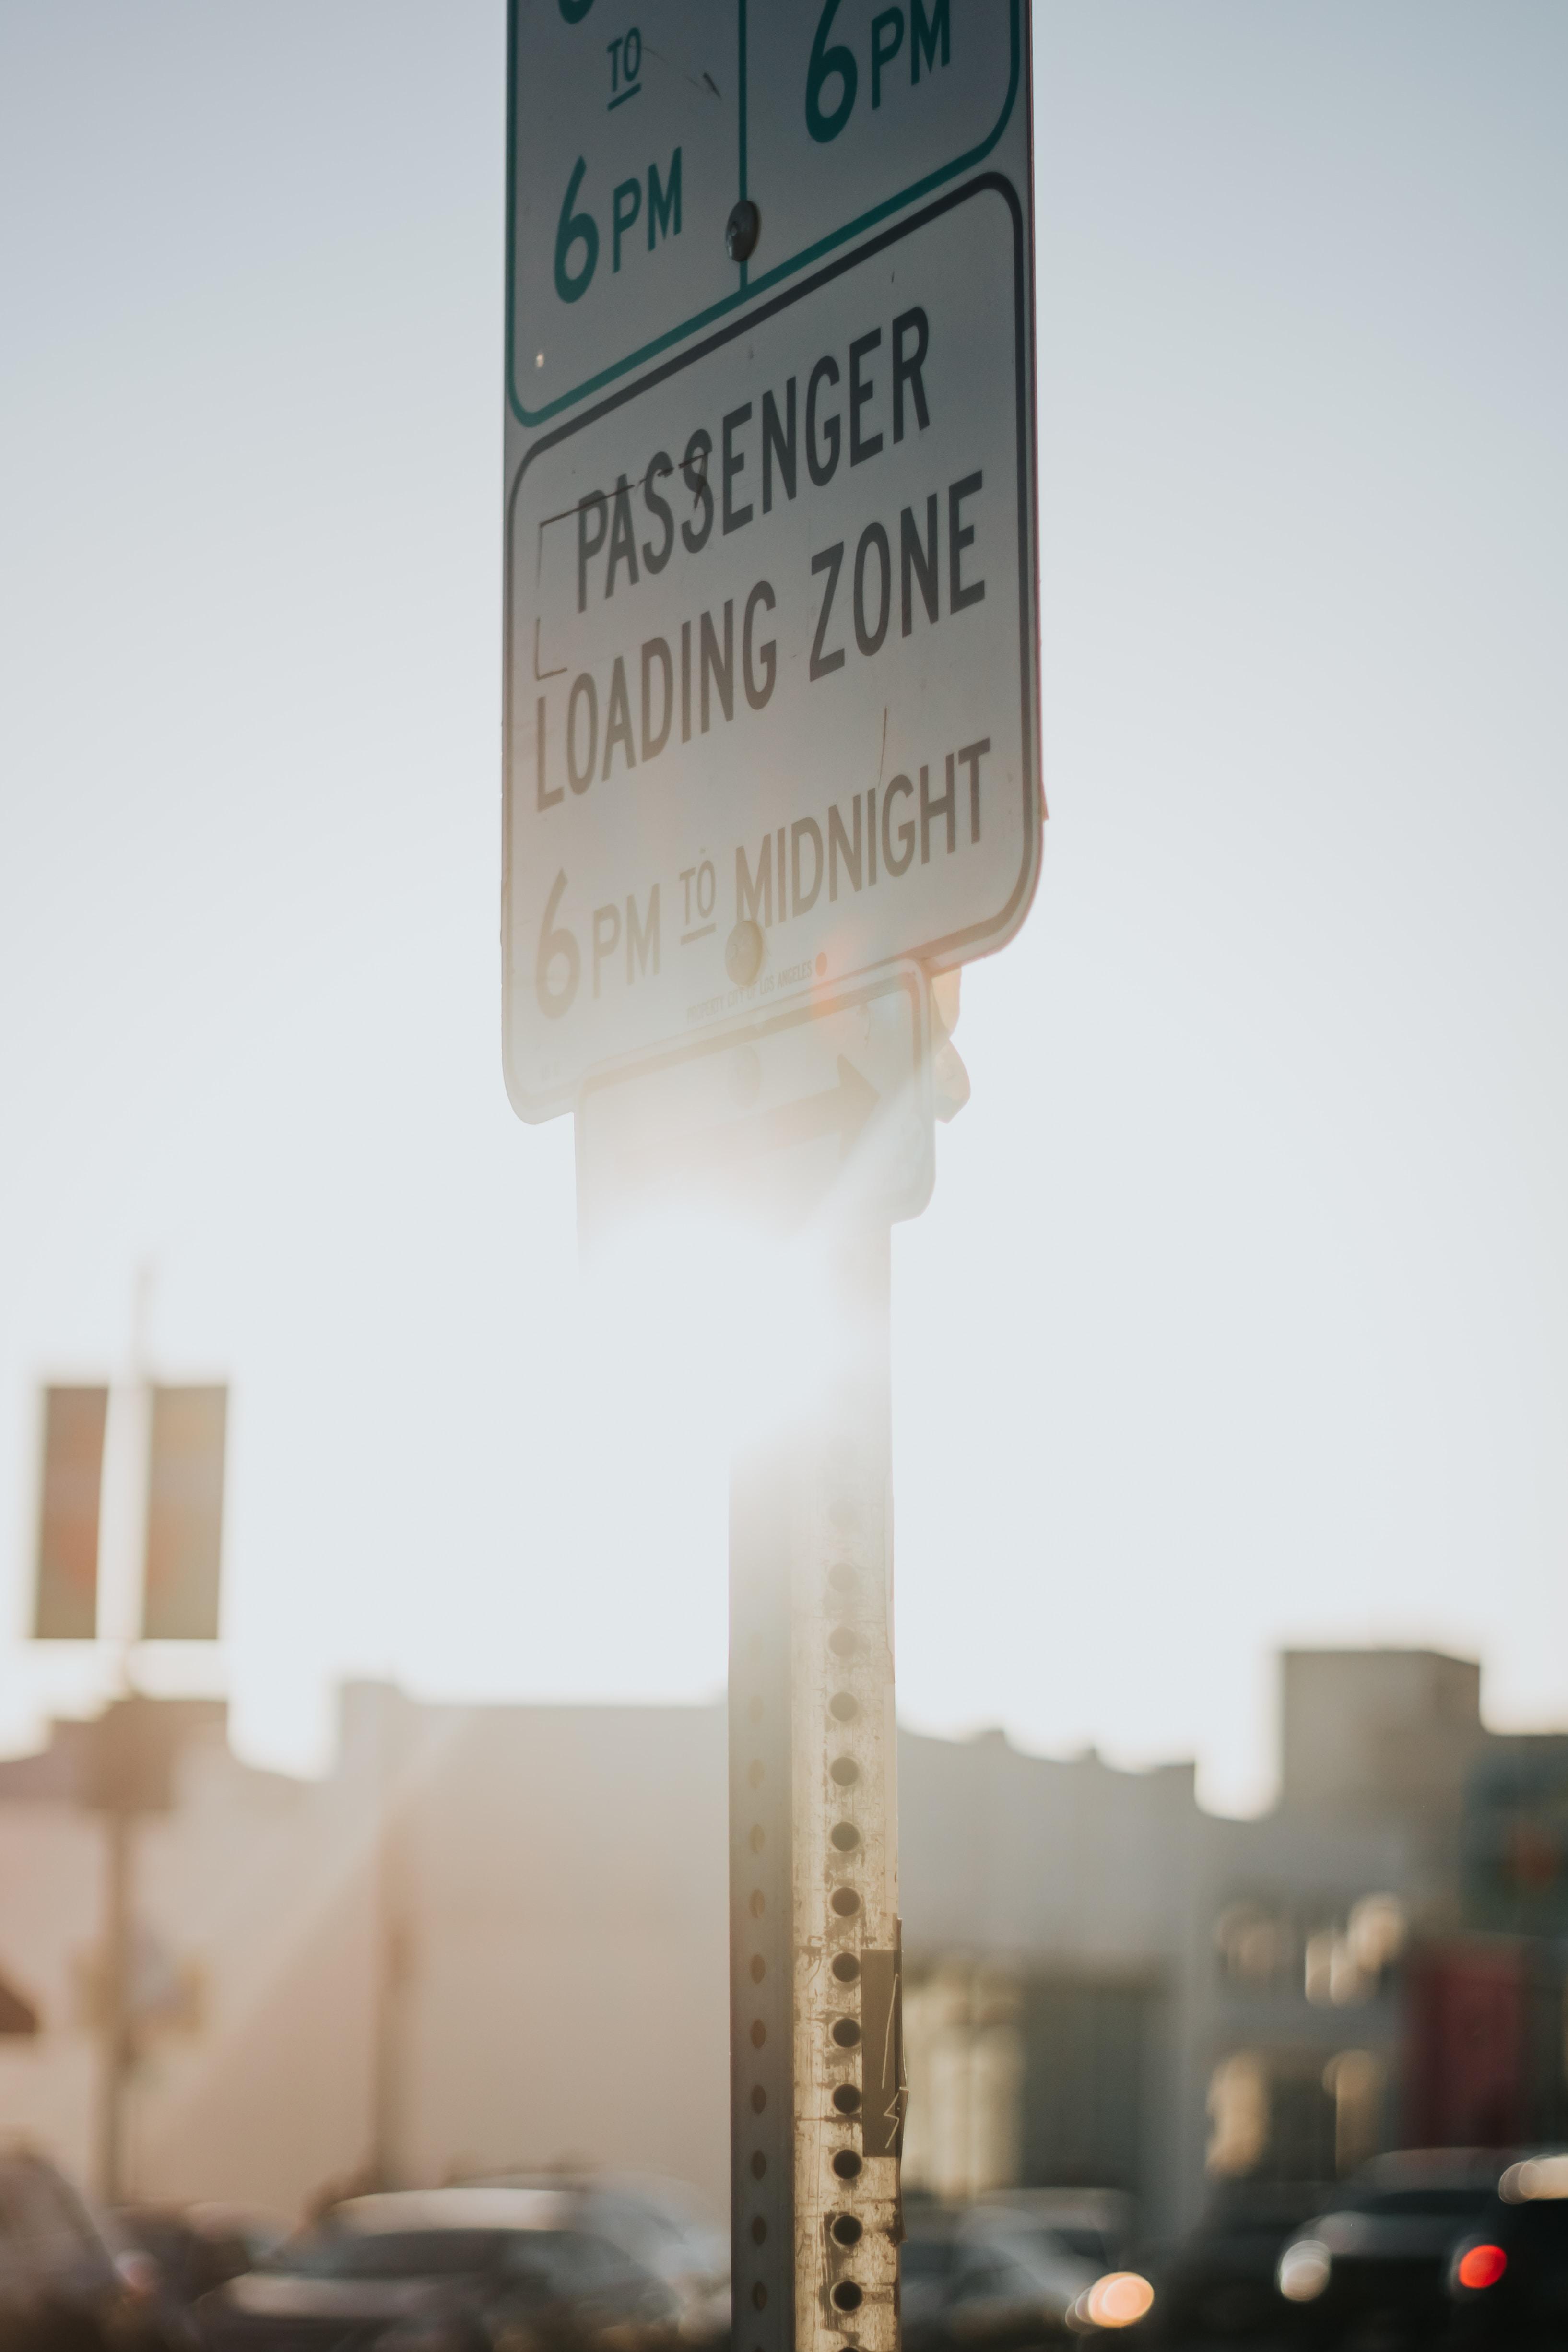 Passenger Loading Zone 6 PM to Midnight